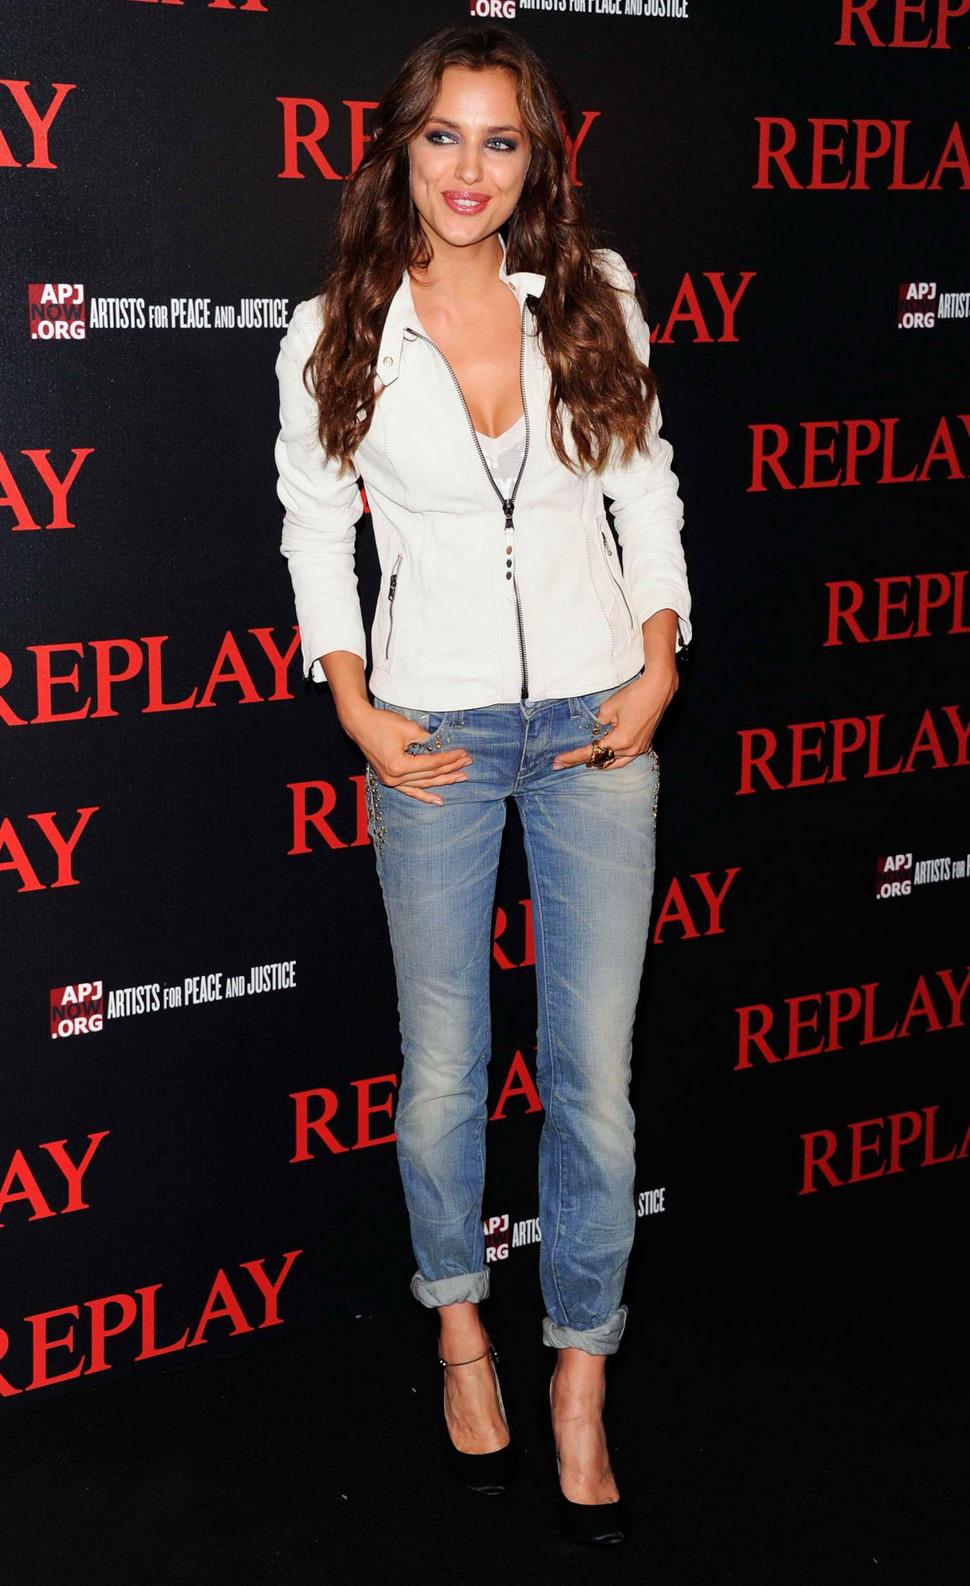 895295931_Irina_Shayk_Replay_Party_Cannes_2_123_37lo.jpg